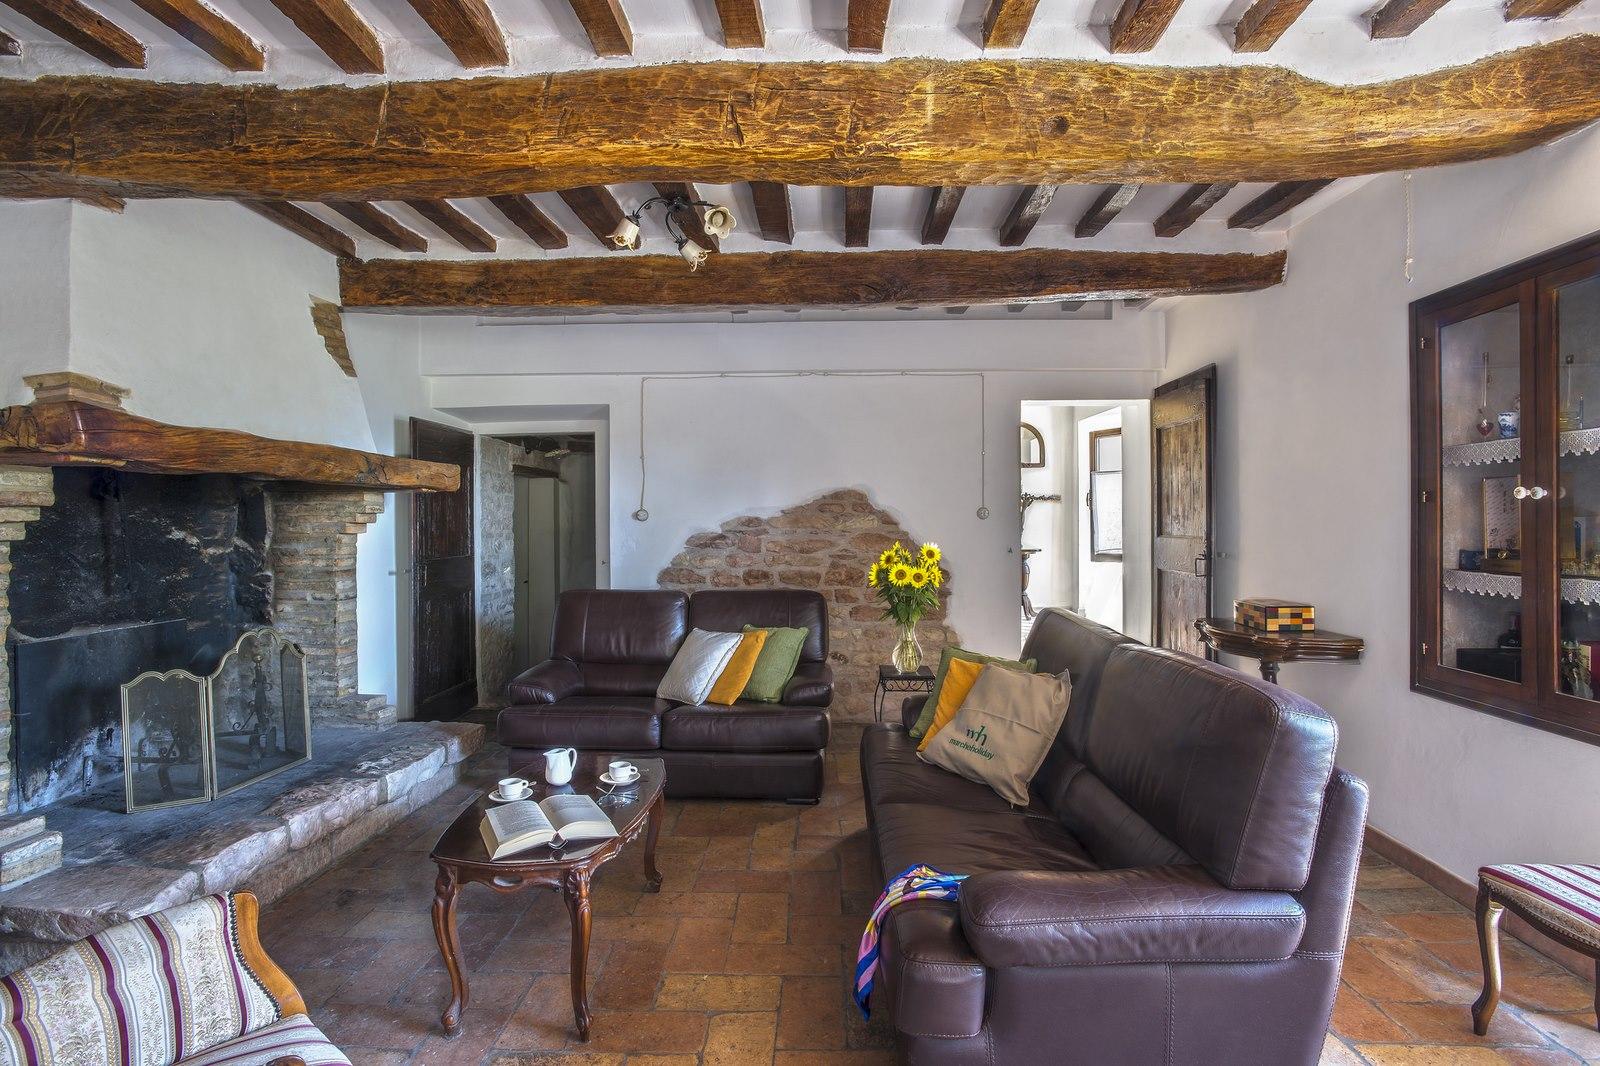 Ferienhaus La Quiete dei Re (2236092), Cagli, Pesaro und Urbino, Marken, Italien, Bild 3